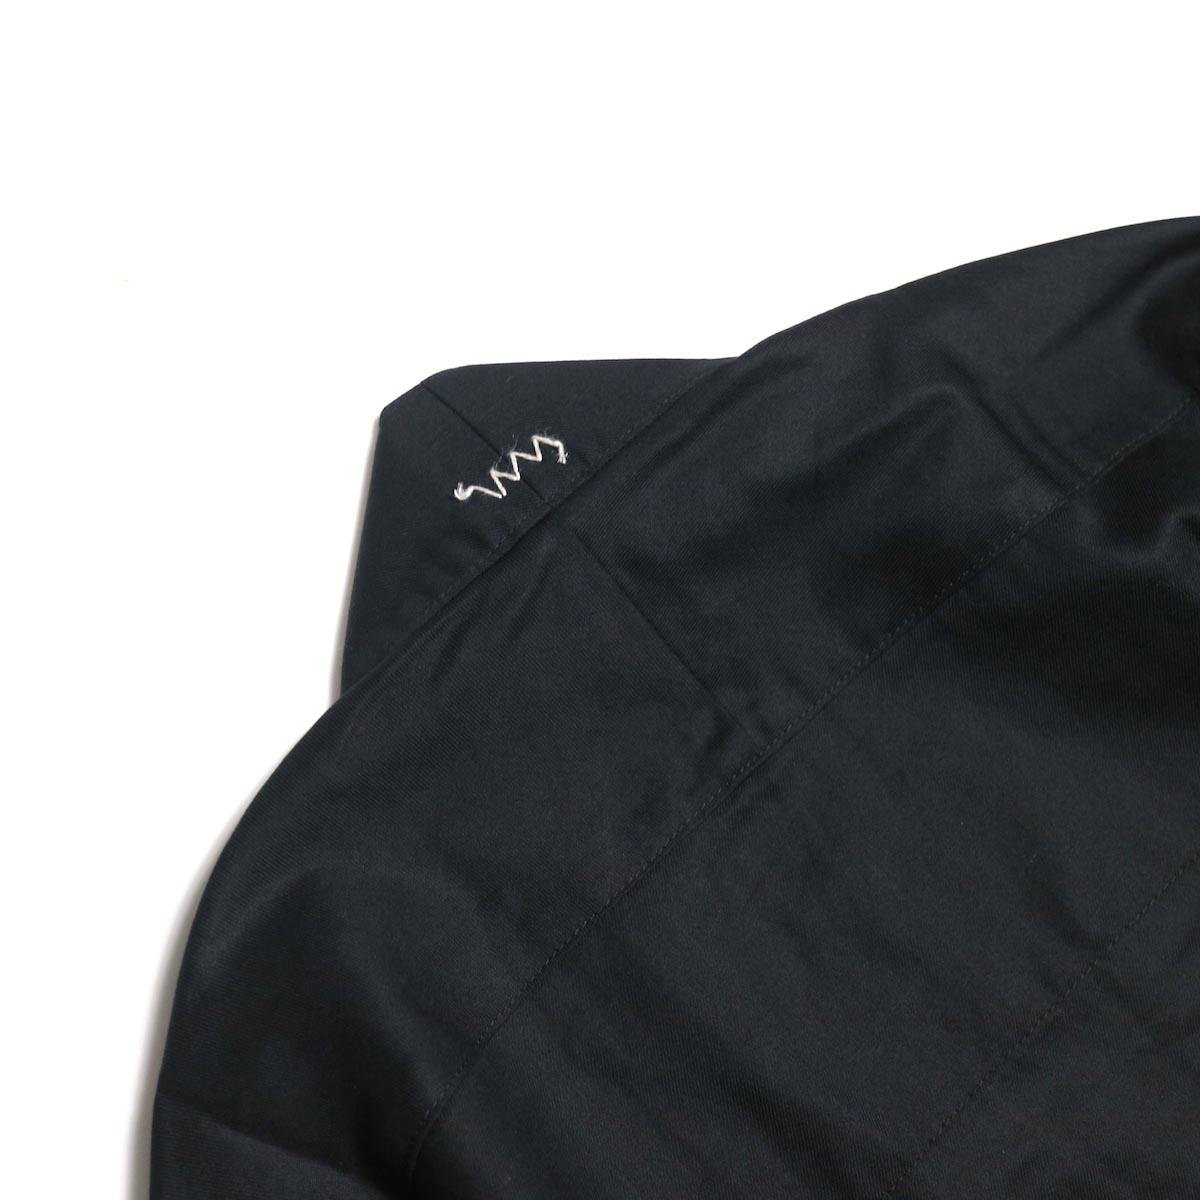 visvim / LHAMO SHIRT (BLACK) 襟裏